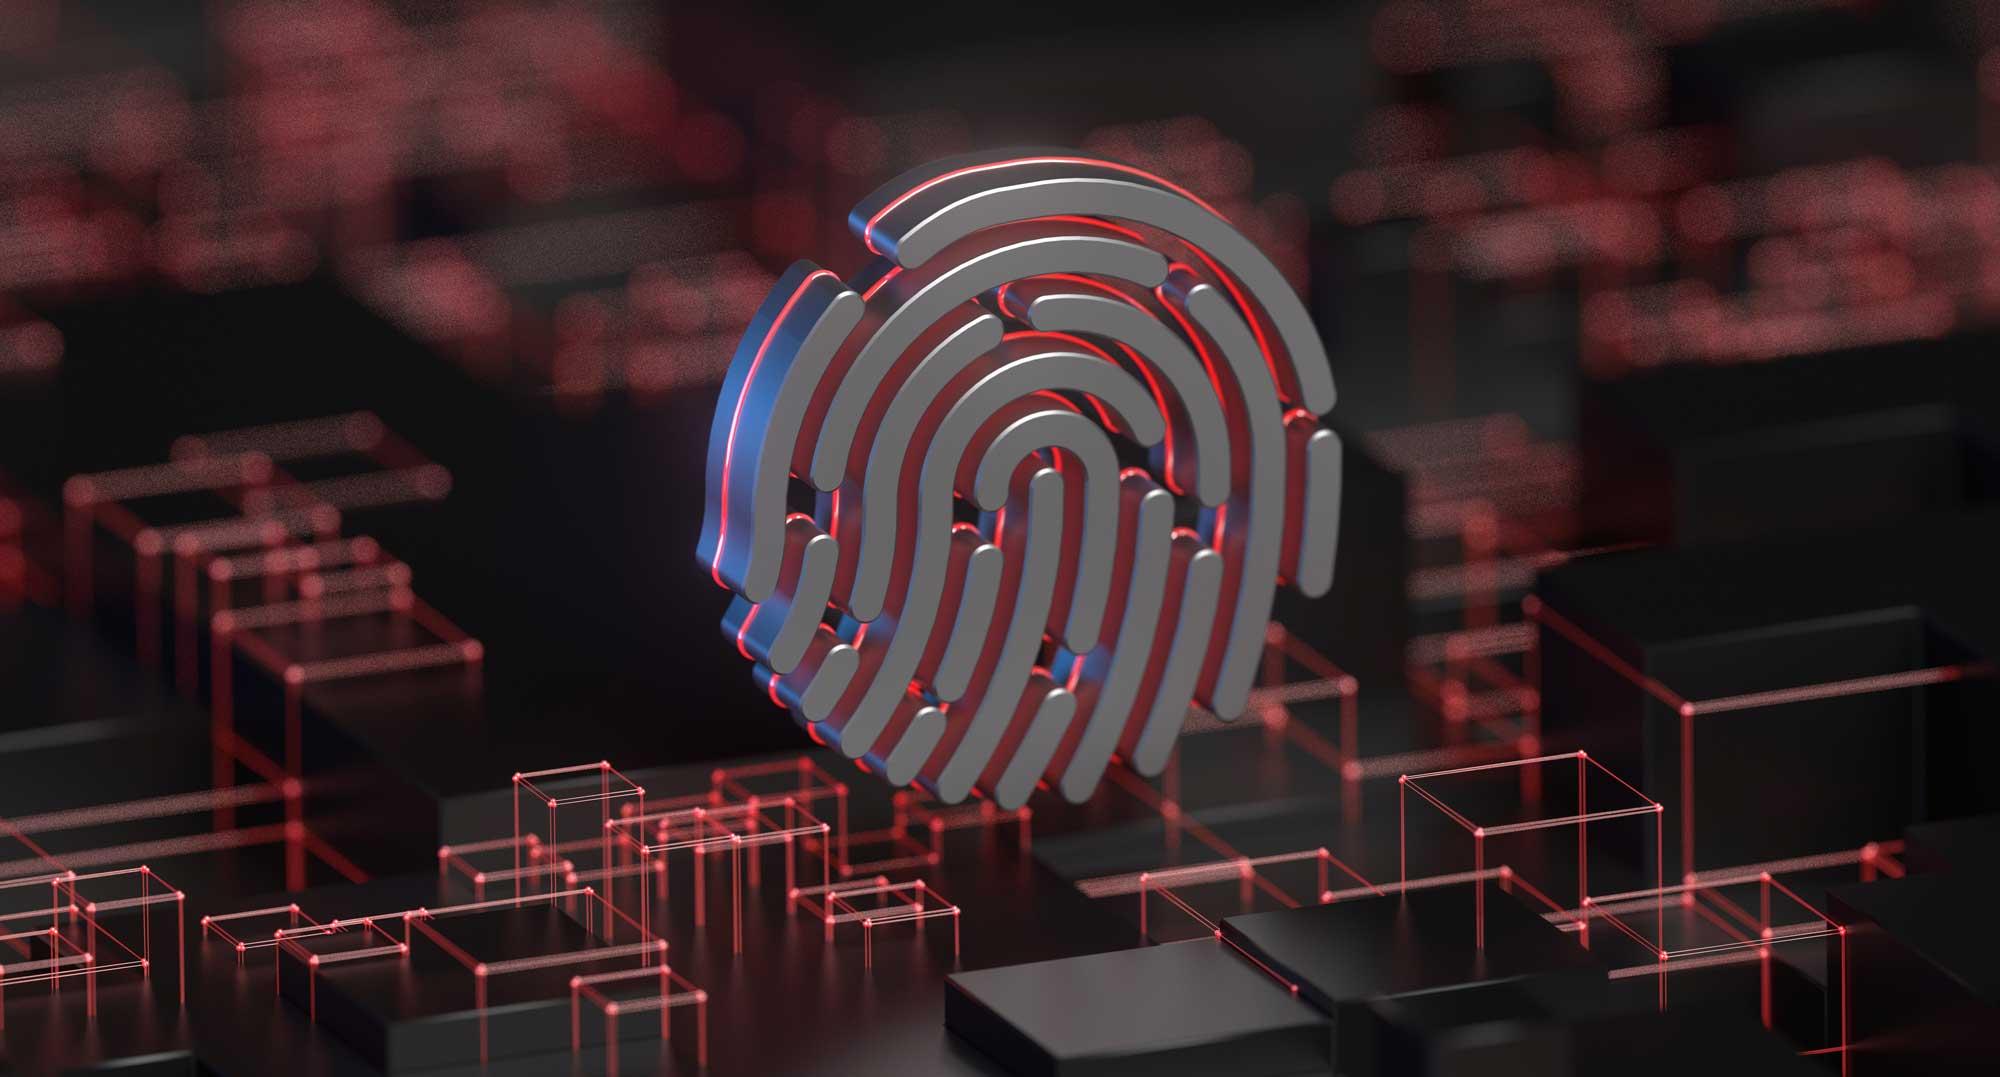 fingerprint symbol over a tech background